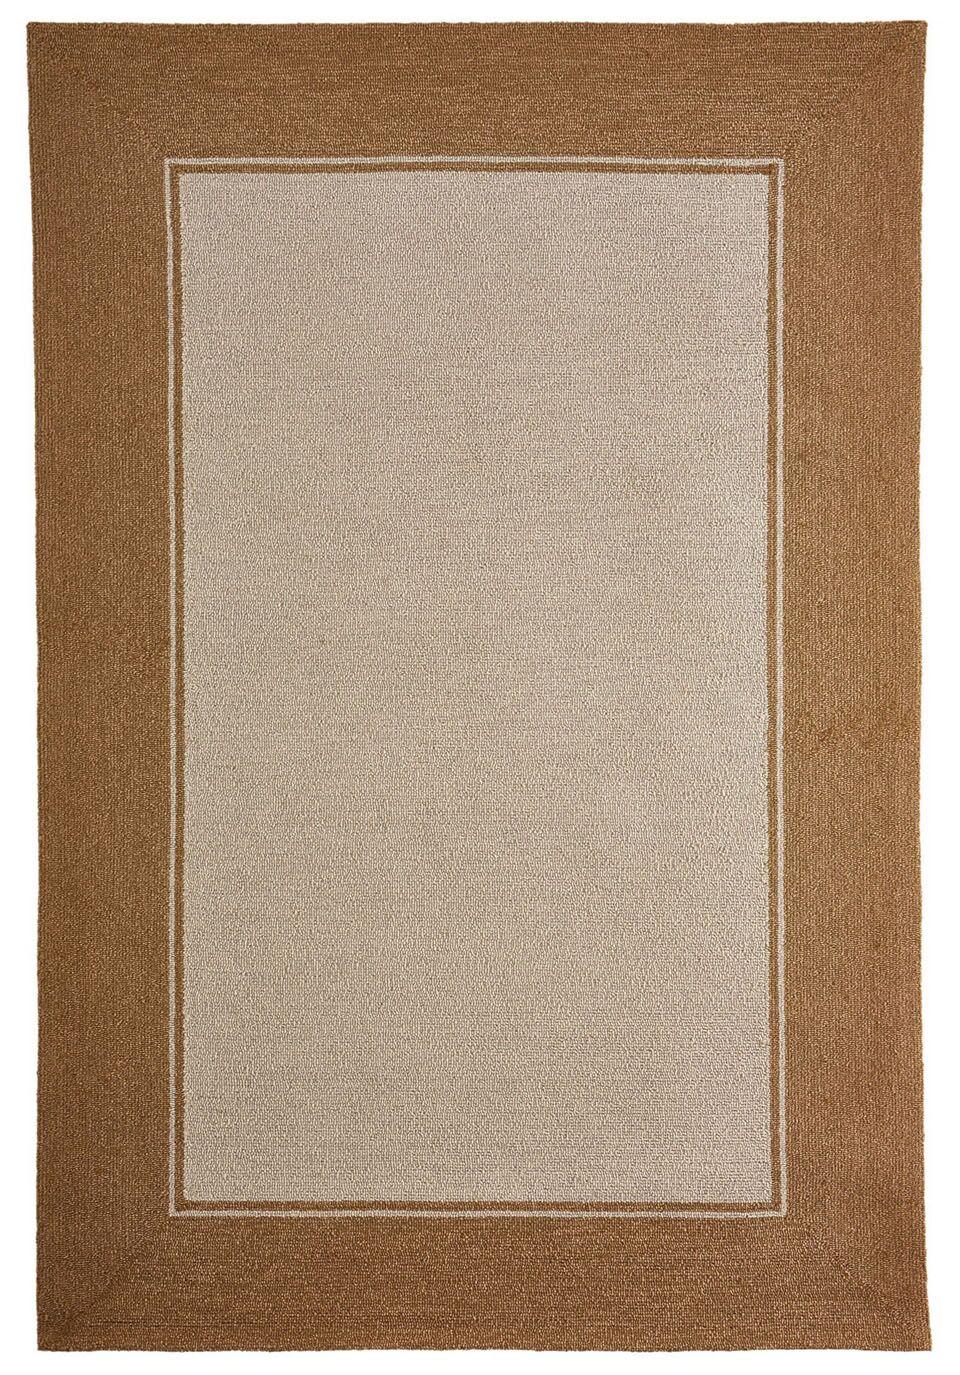 Enoch Border Hand-Woven Camel Indoor/Outdoor Area Rug Rug Size: Rectangle 5' x 7'6